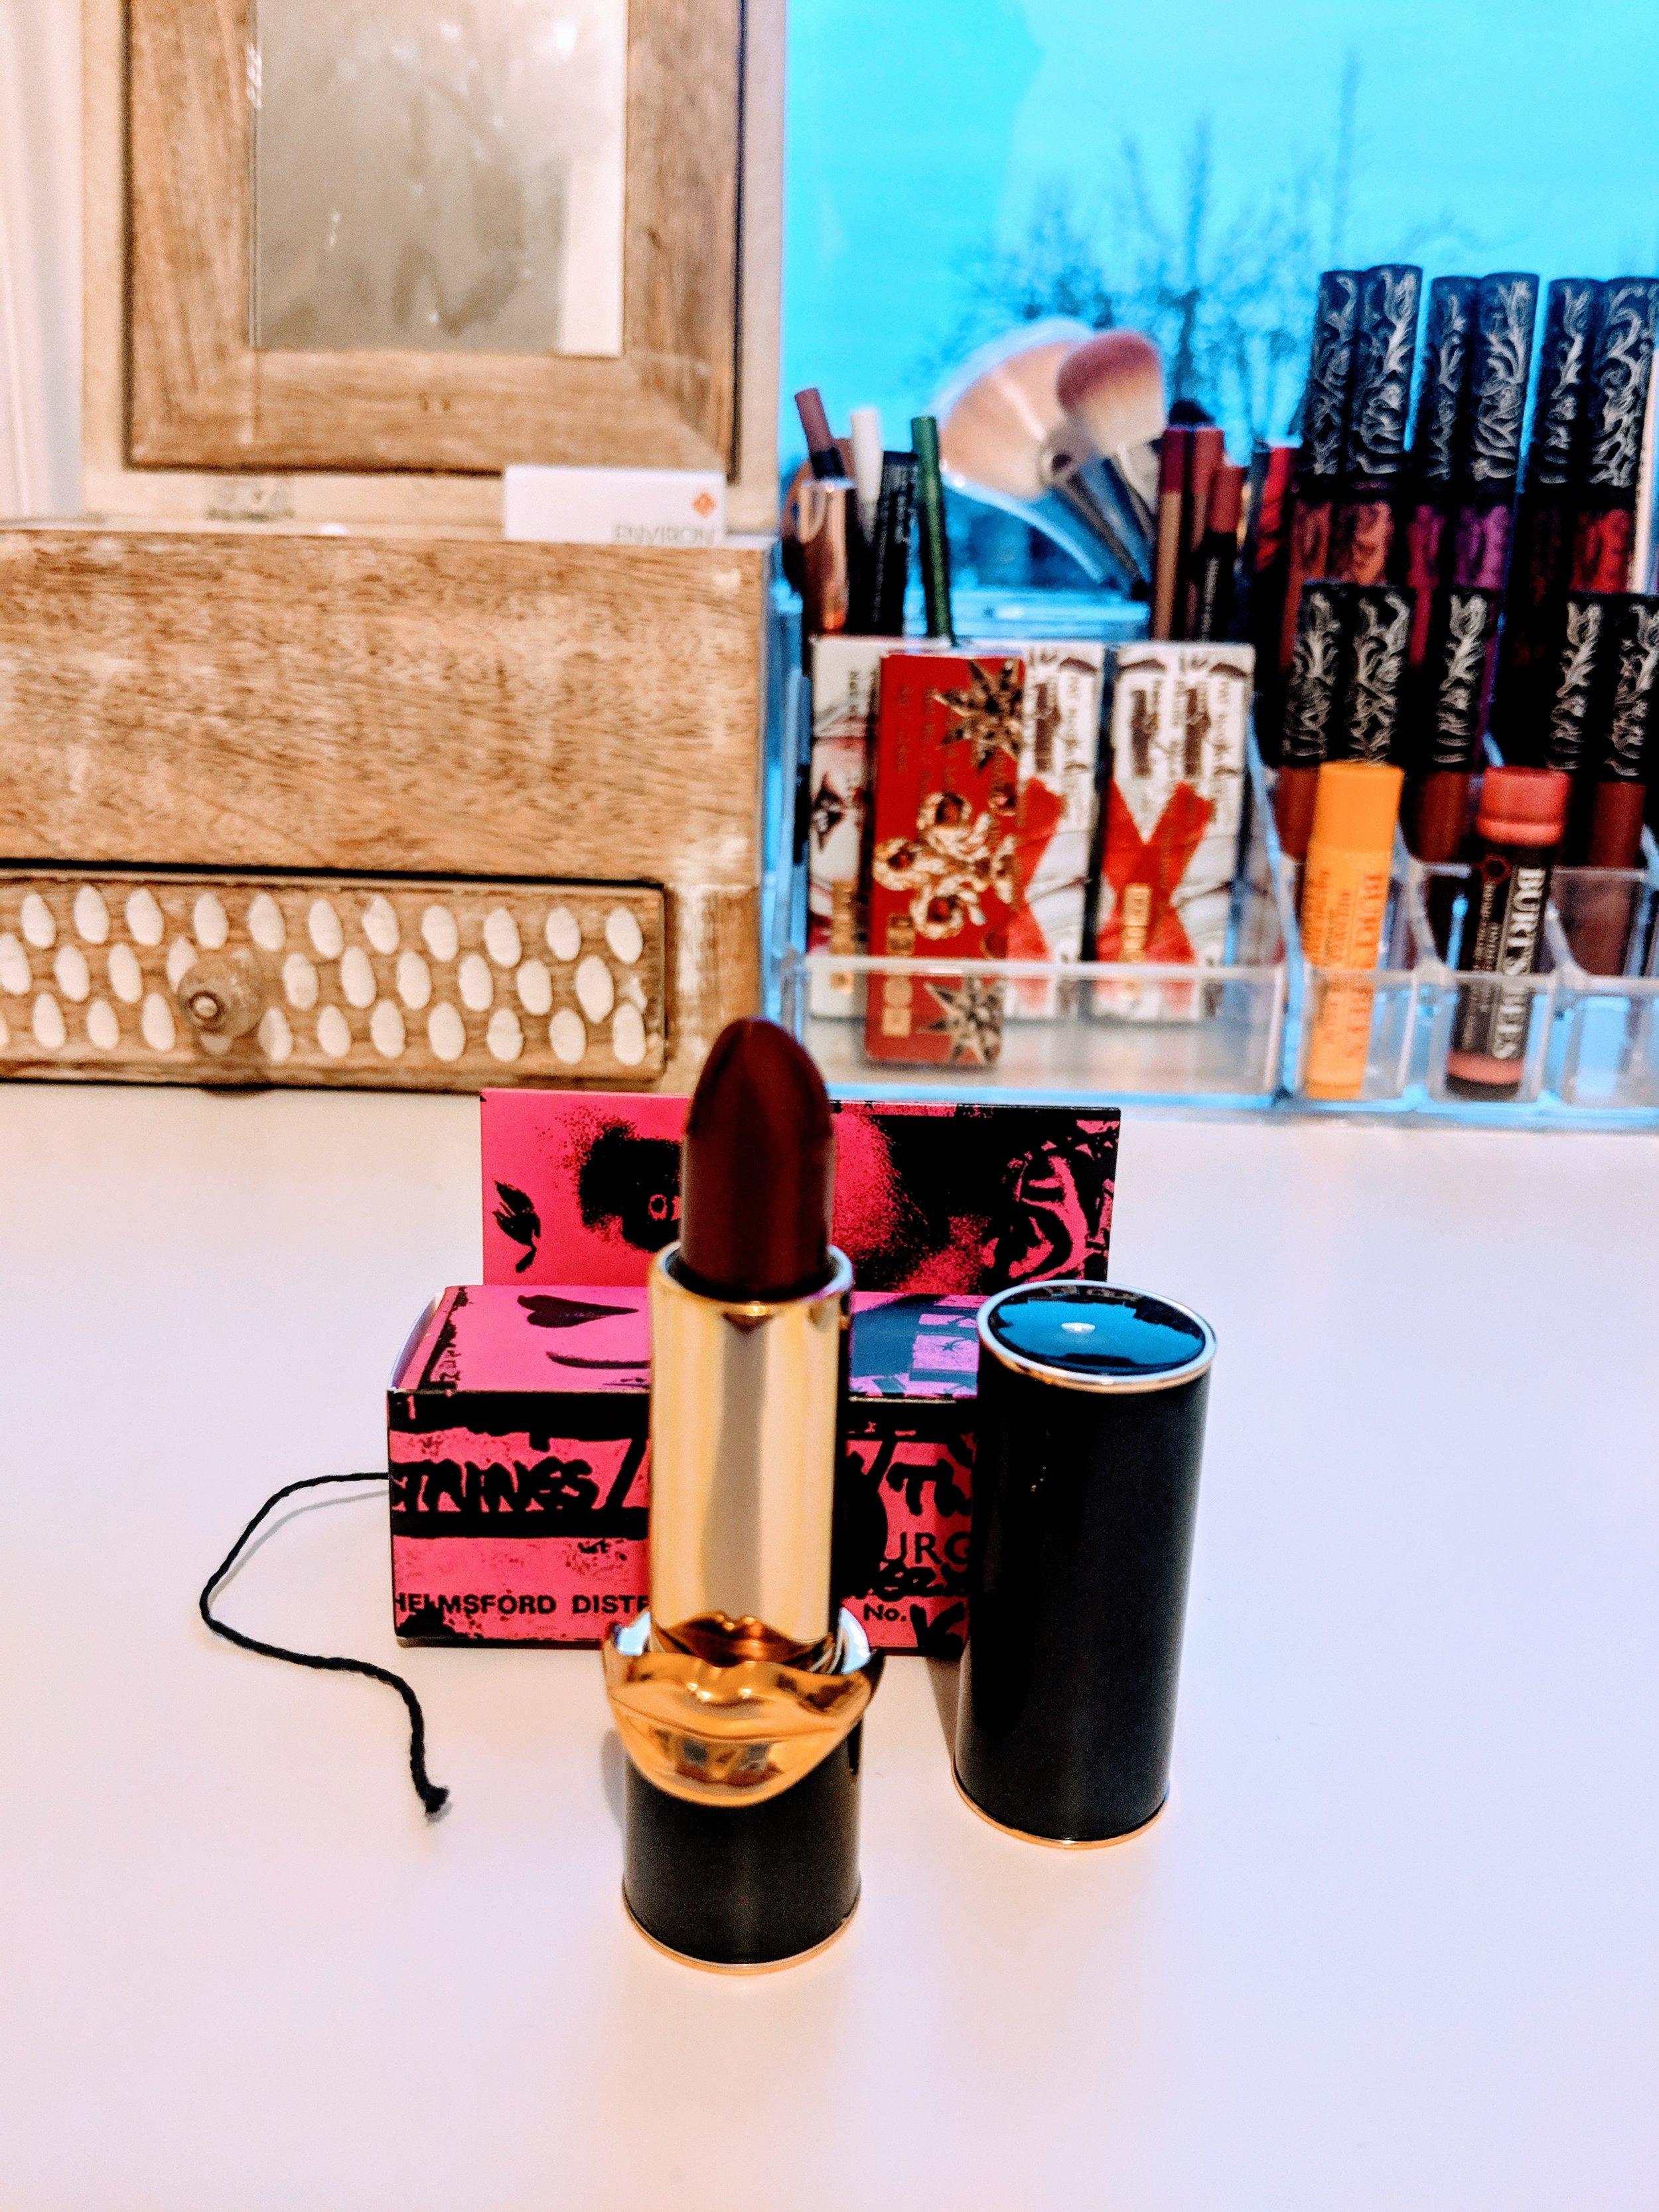 Honest makeup reviews -